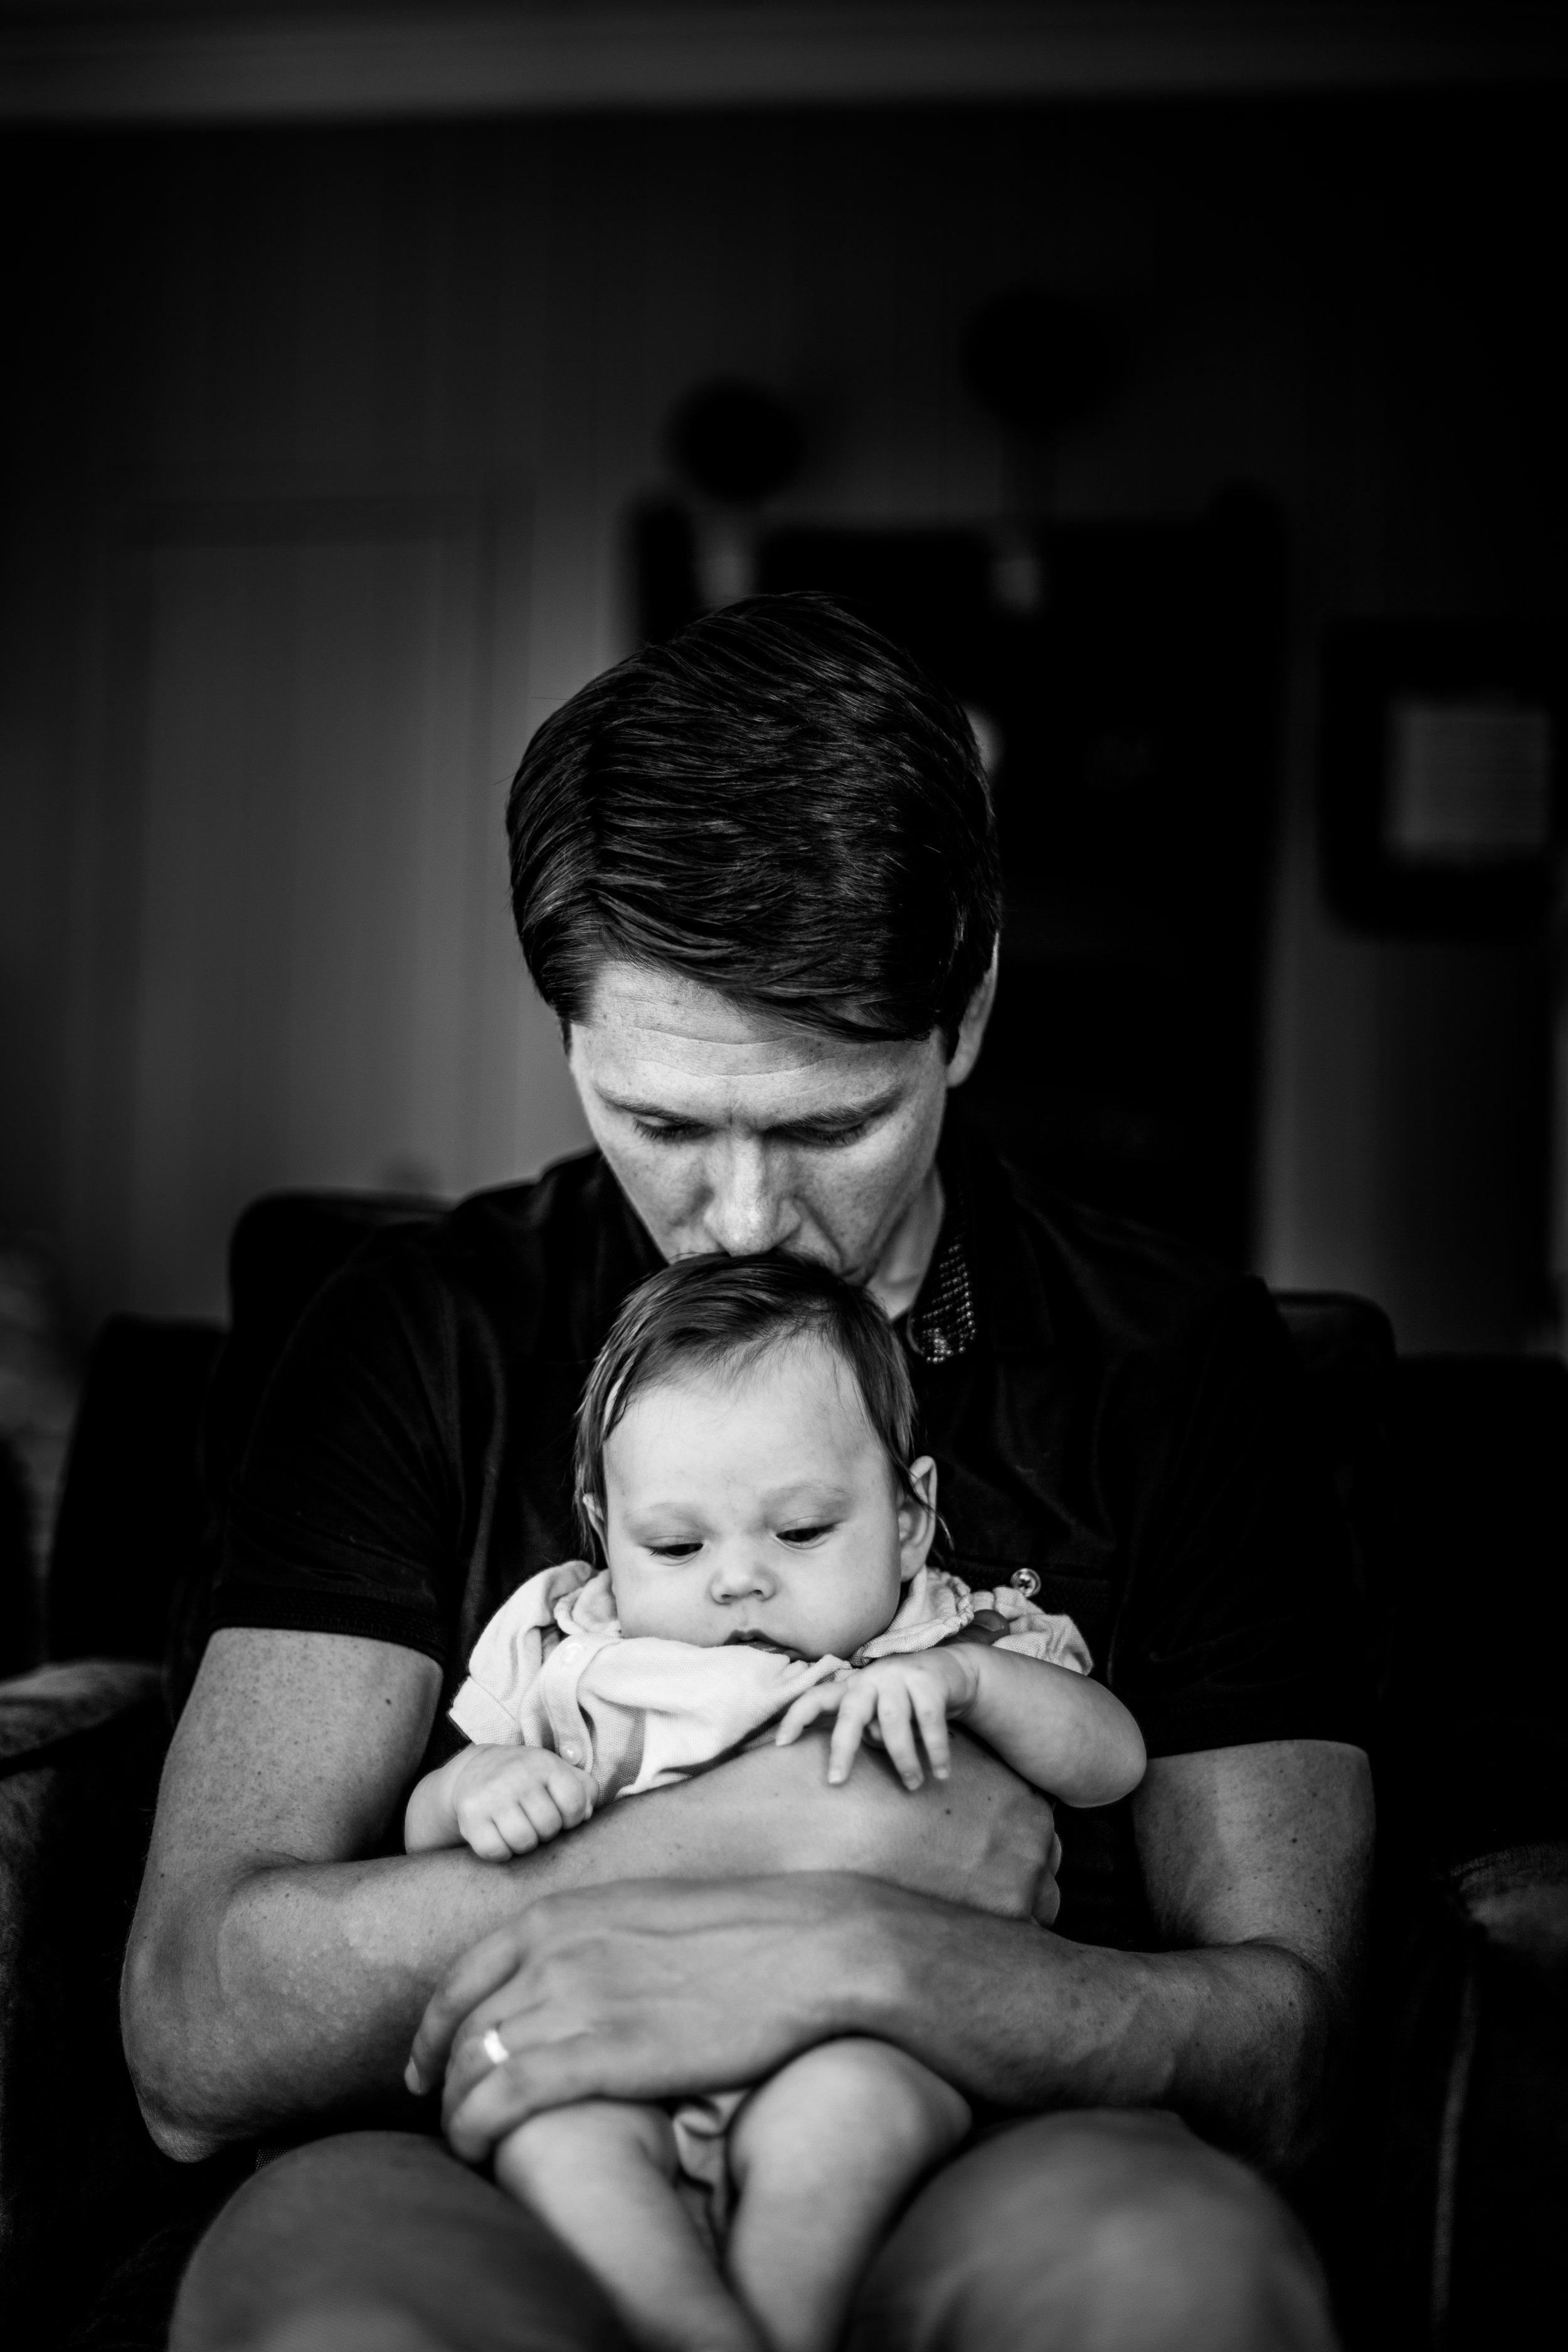 morningside-buckhead-atlanta-newborn-photography-angela-elliott-wingard-45.jpg